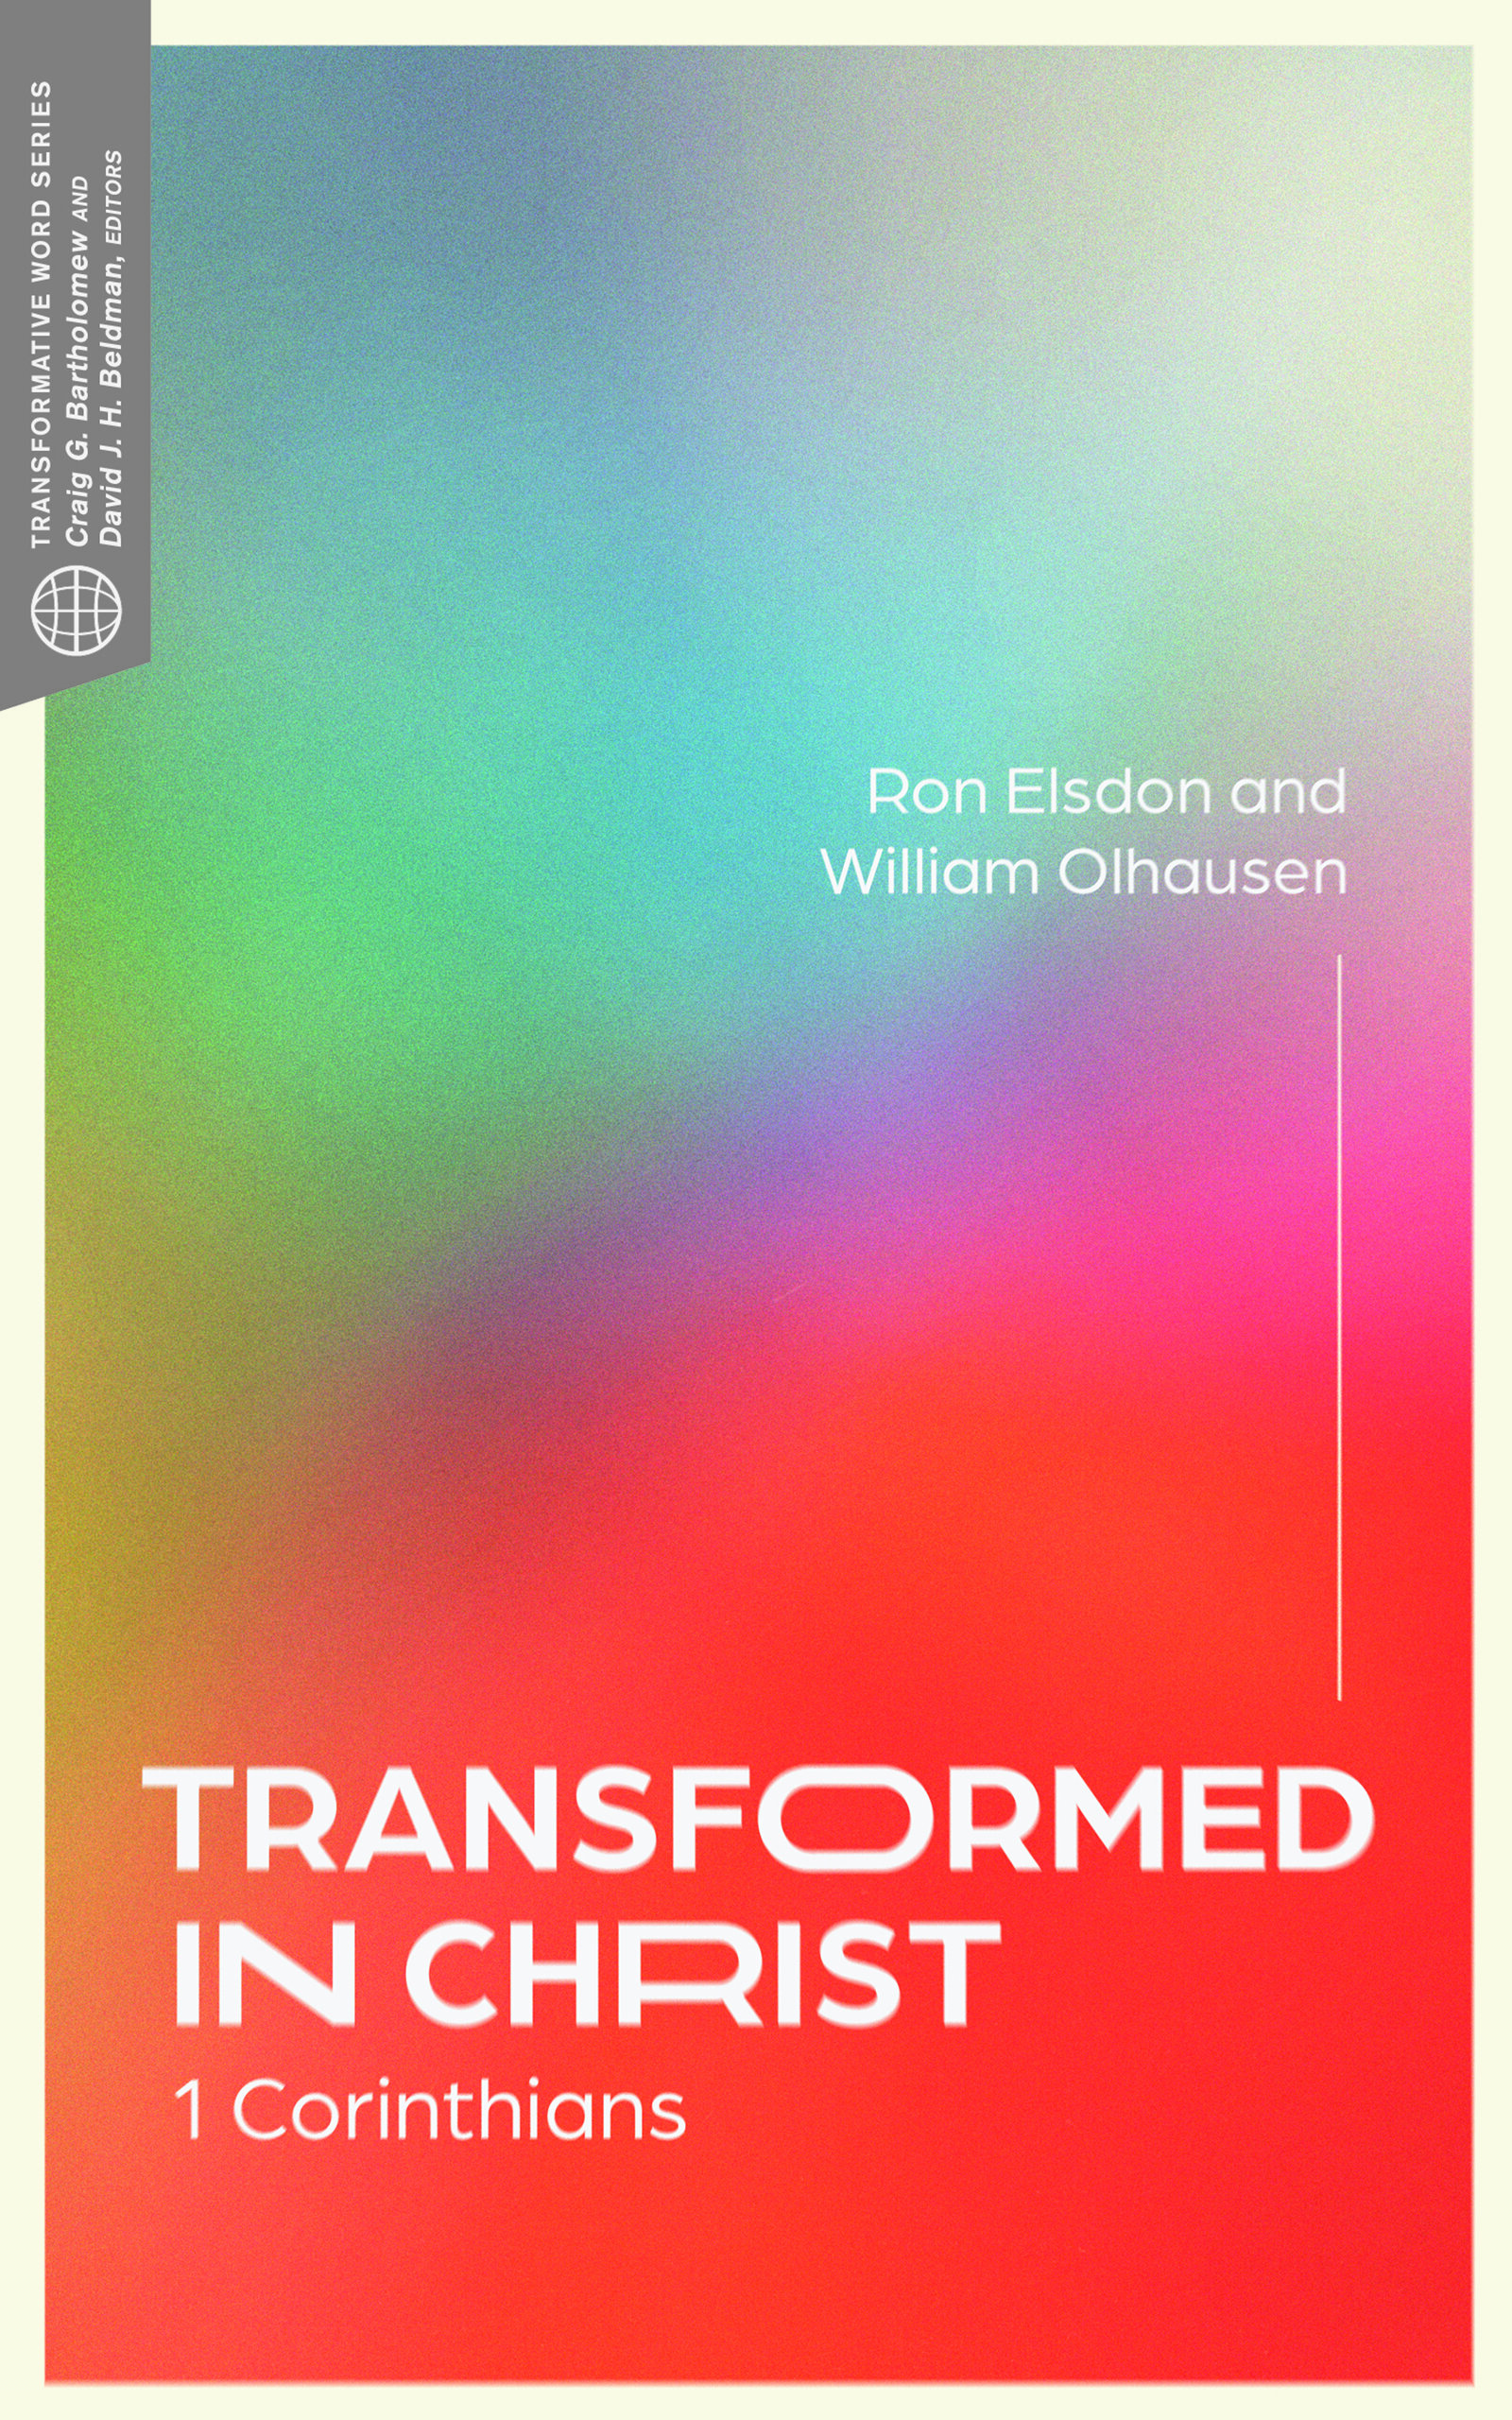 Transformed in Christ